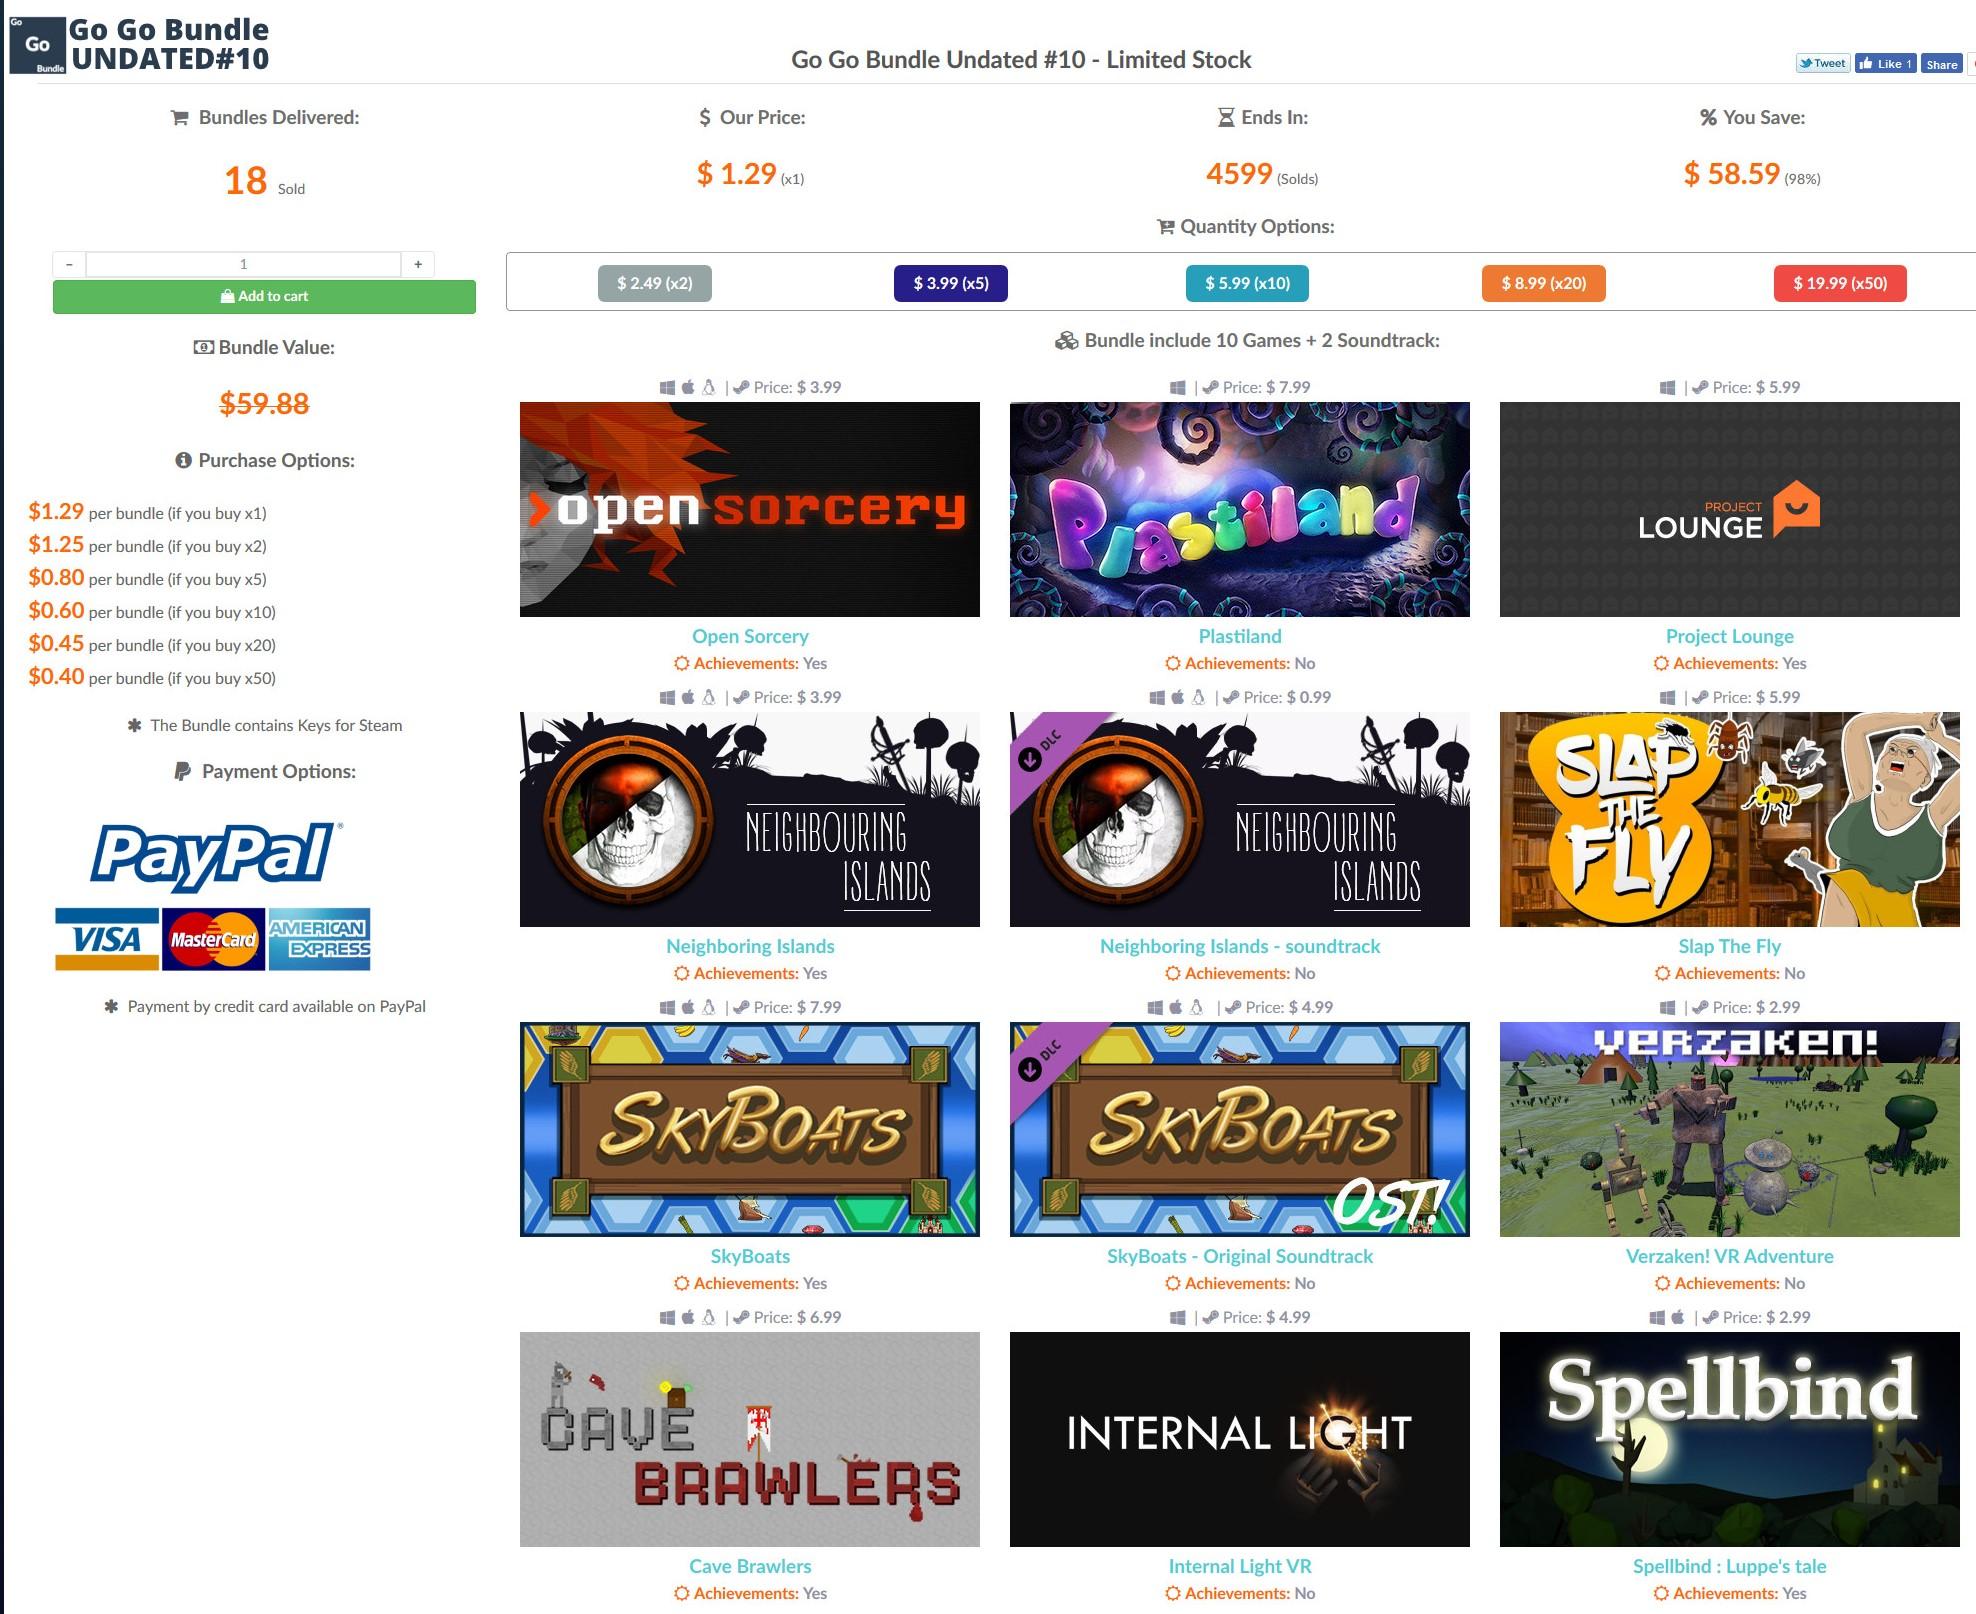 Screenshot_2018-09-14 Go Go Bundle Undated #10 - Limited Stock.jpg